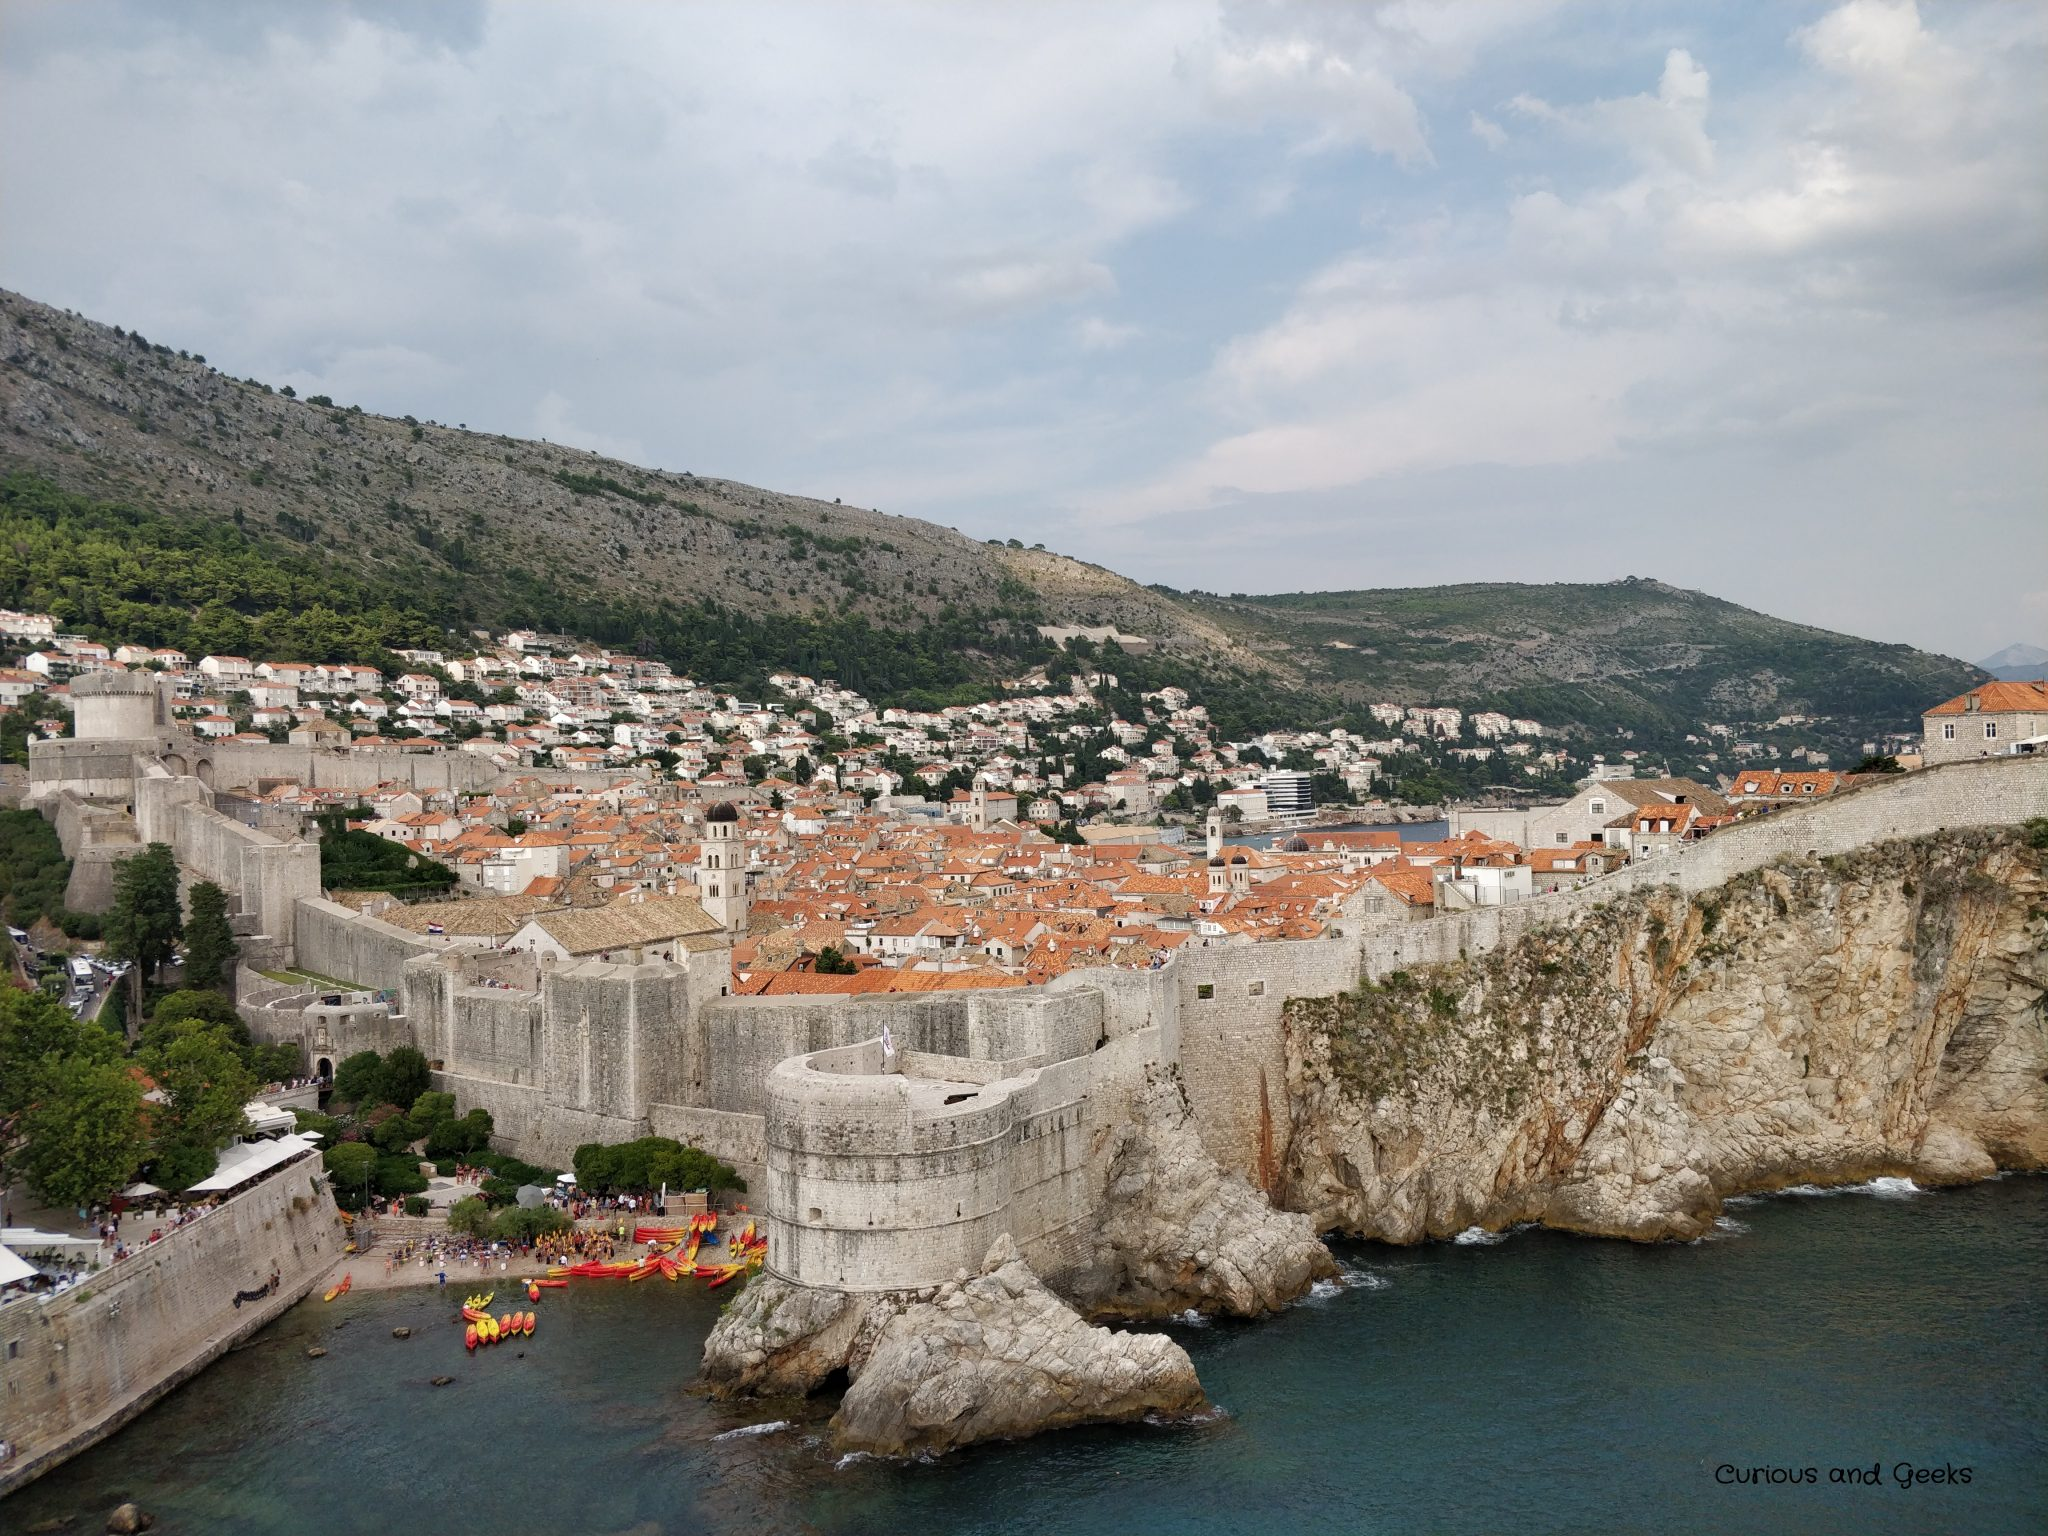 View from Lovrijenac of Dubrovnik - King's Landing in Game of Thrones